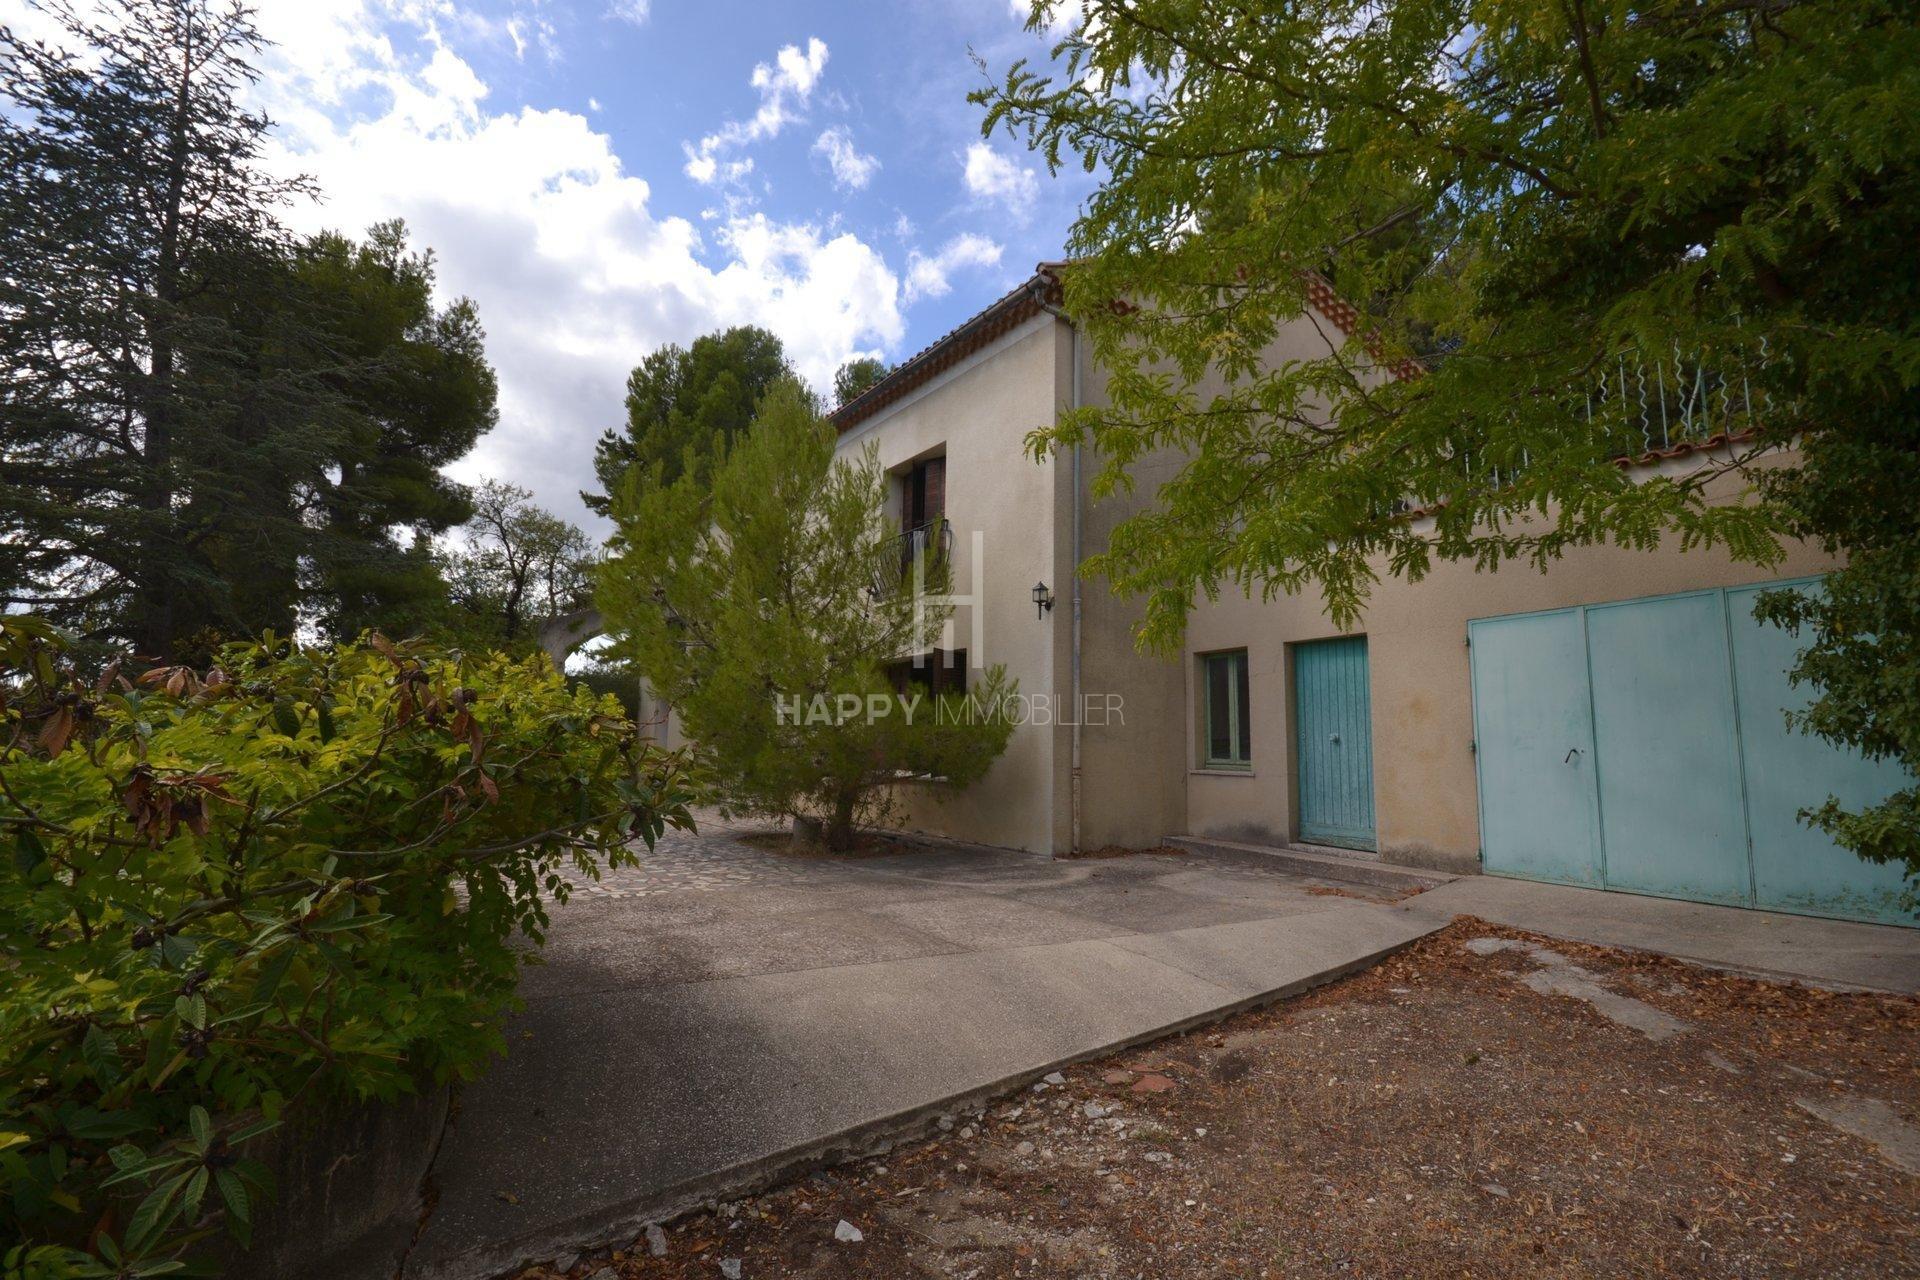 Near the center of the village of Maussane les Alpilles